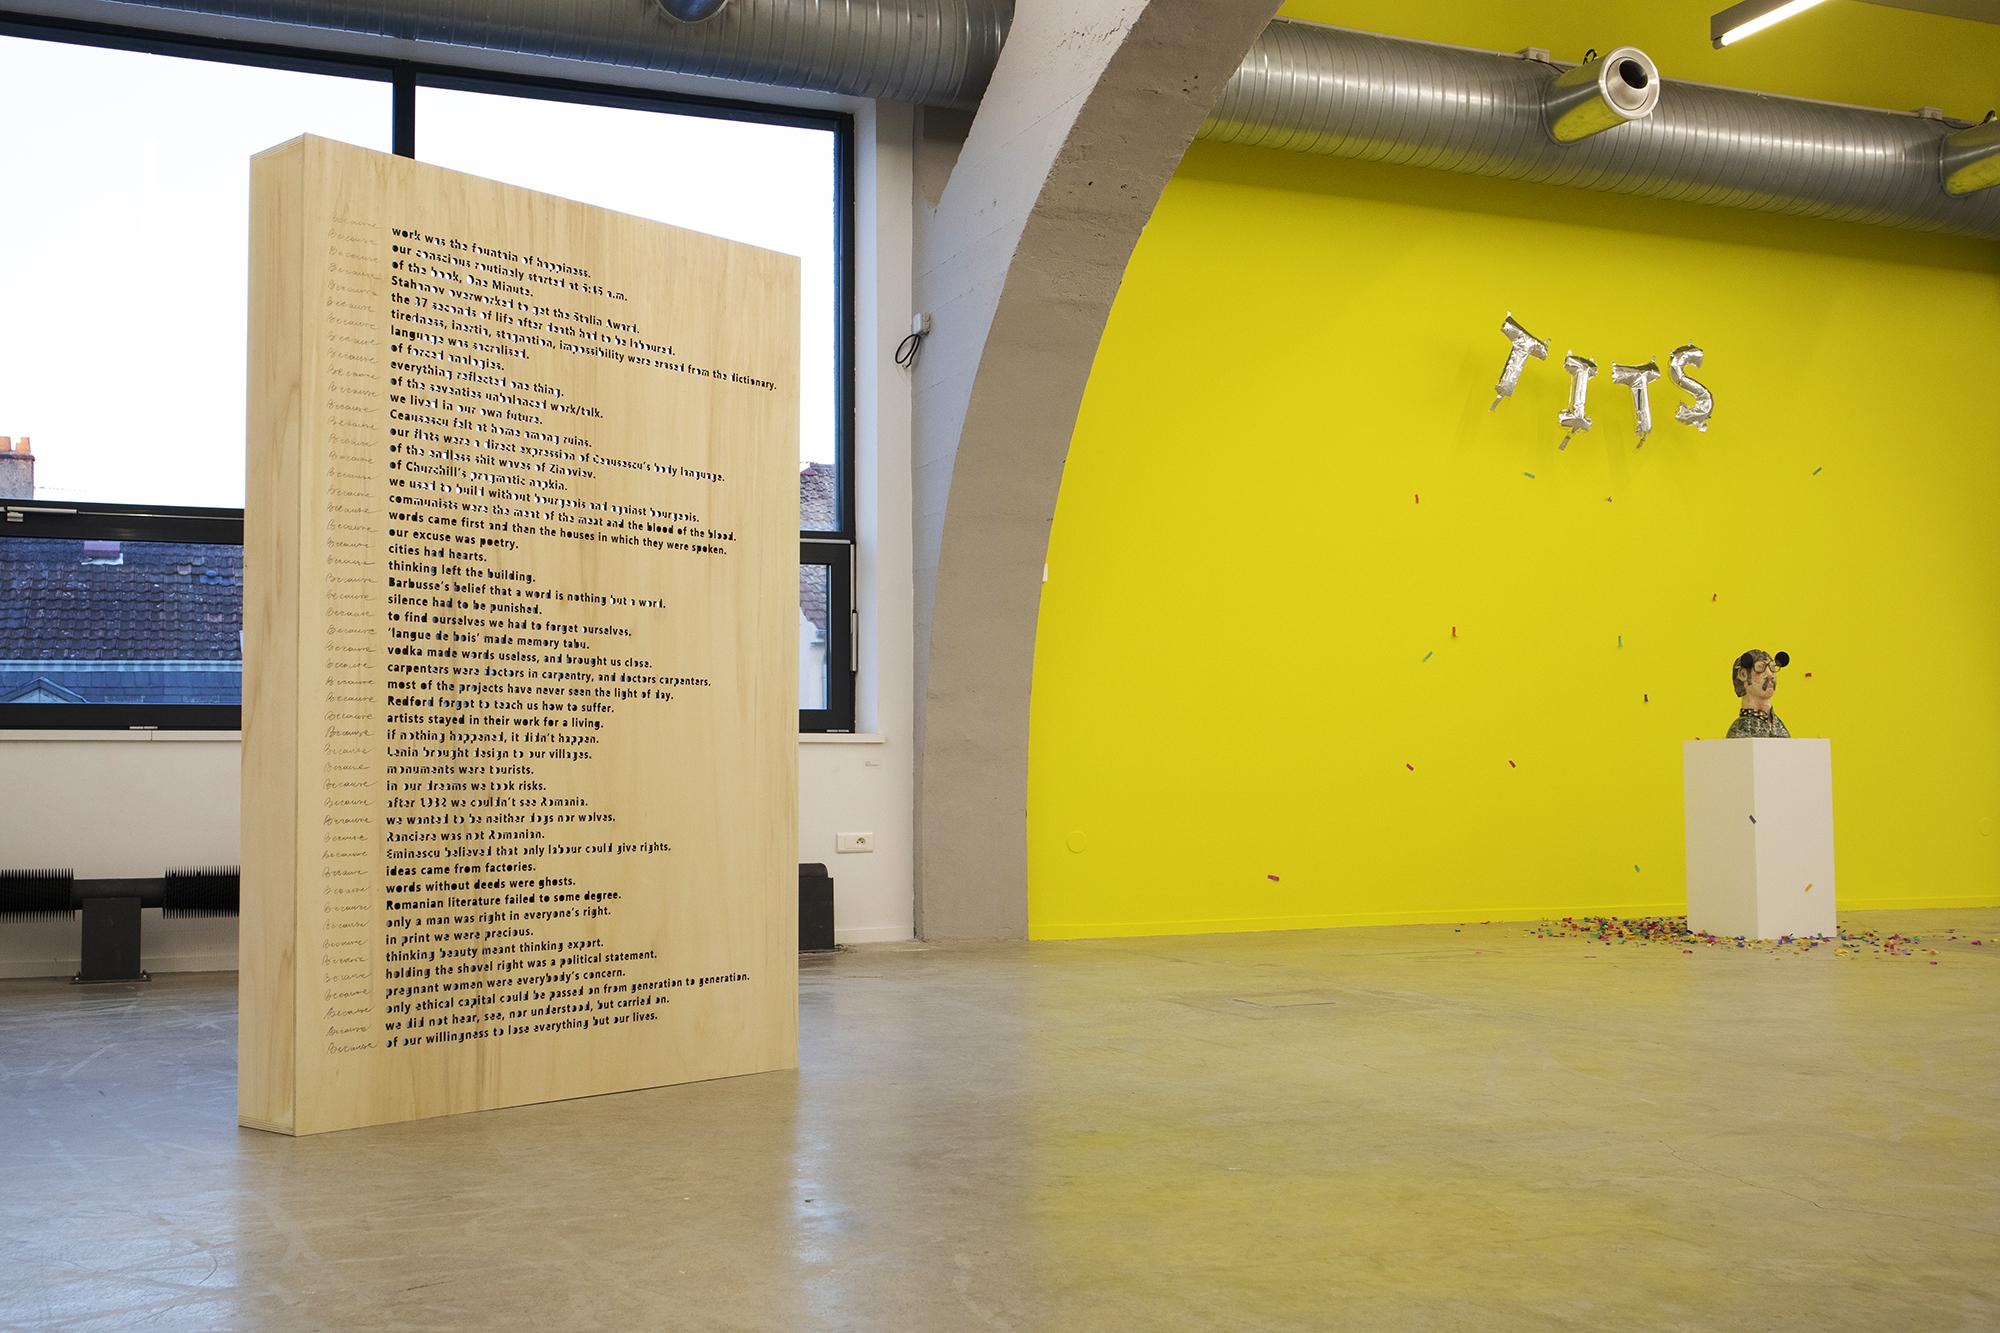 Alex-Mirutziu-Because-Kunsthalle-Mulhouse-1.jpg